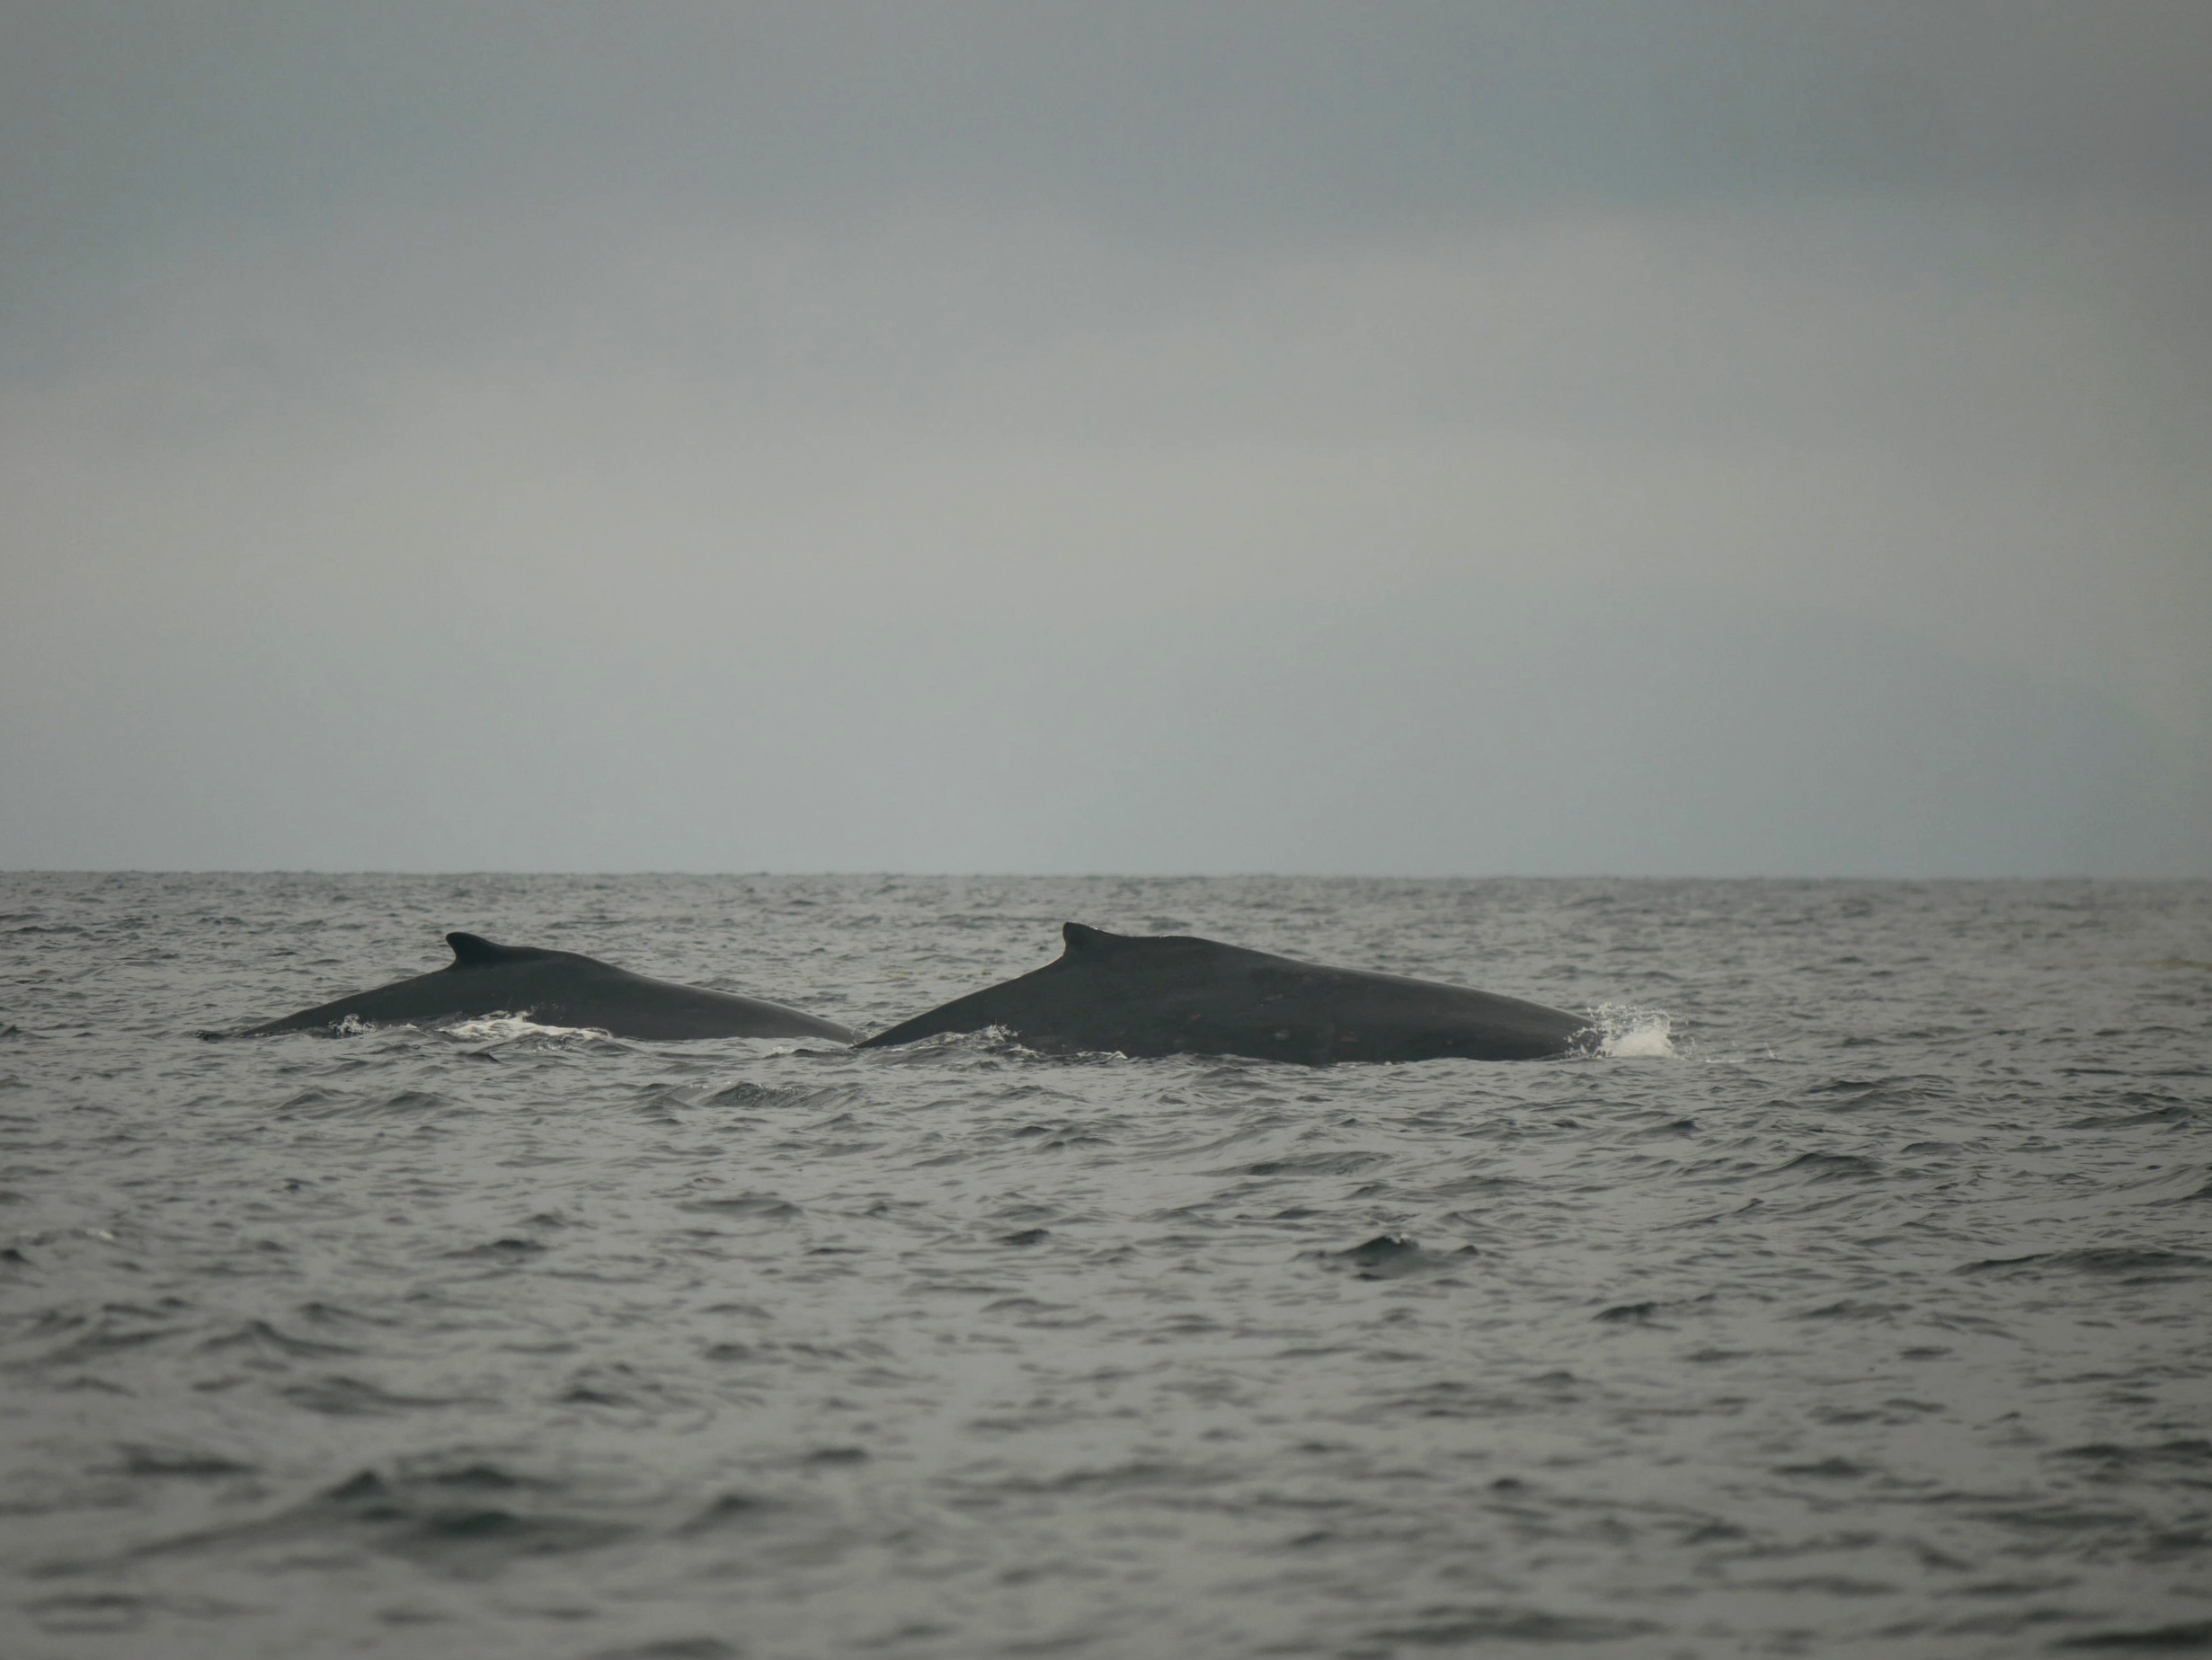 Two humpbacks is double the fun! Photo by Alanna Vivani